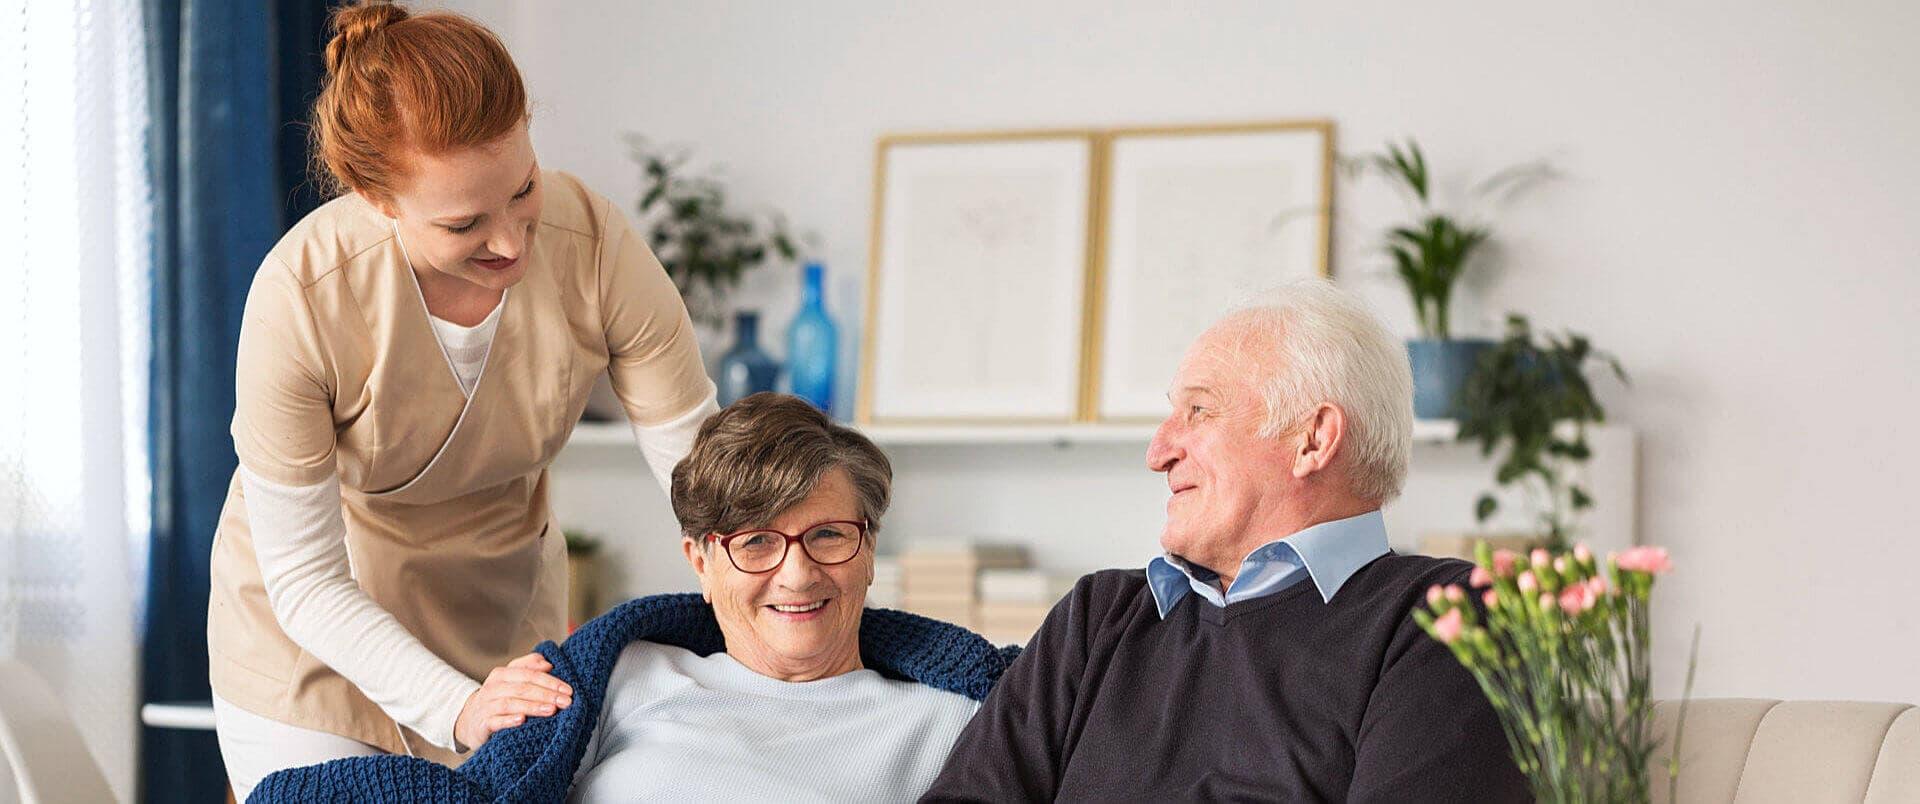 caregiver putting blanket at senior woman and senior man smiling